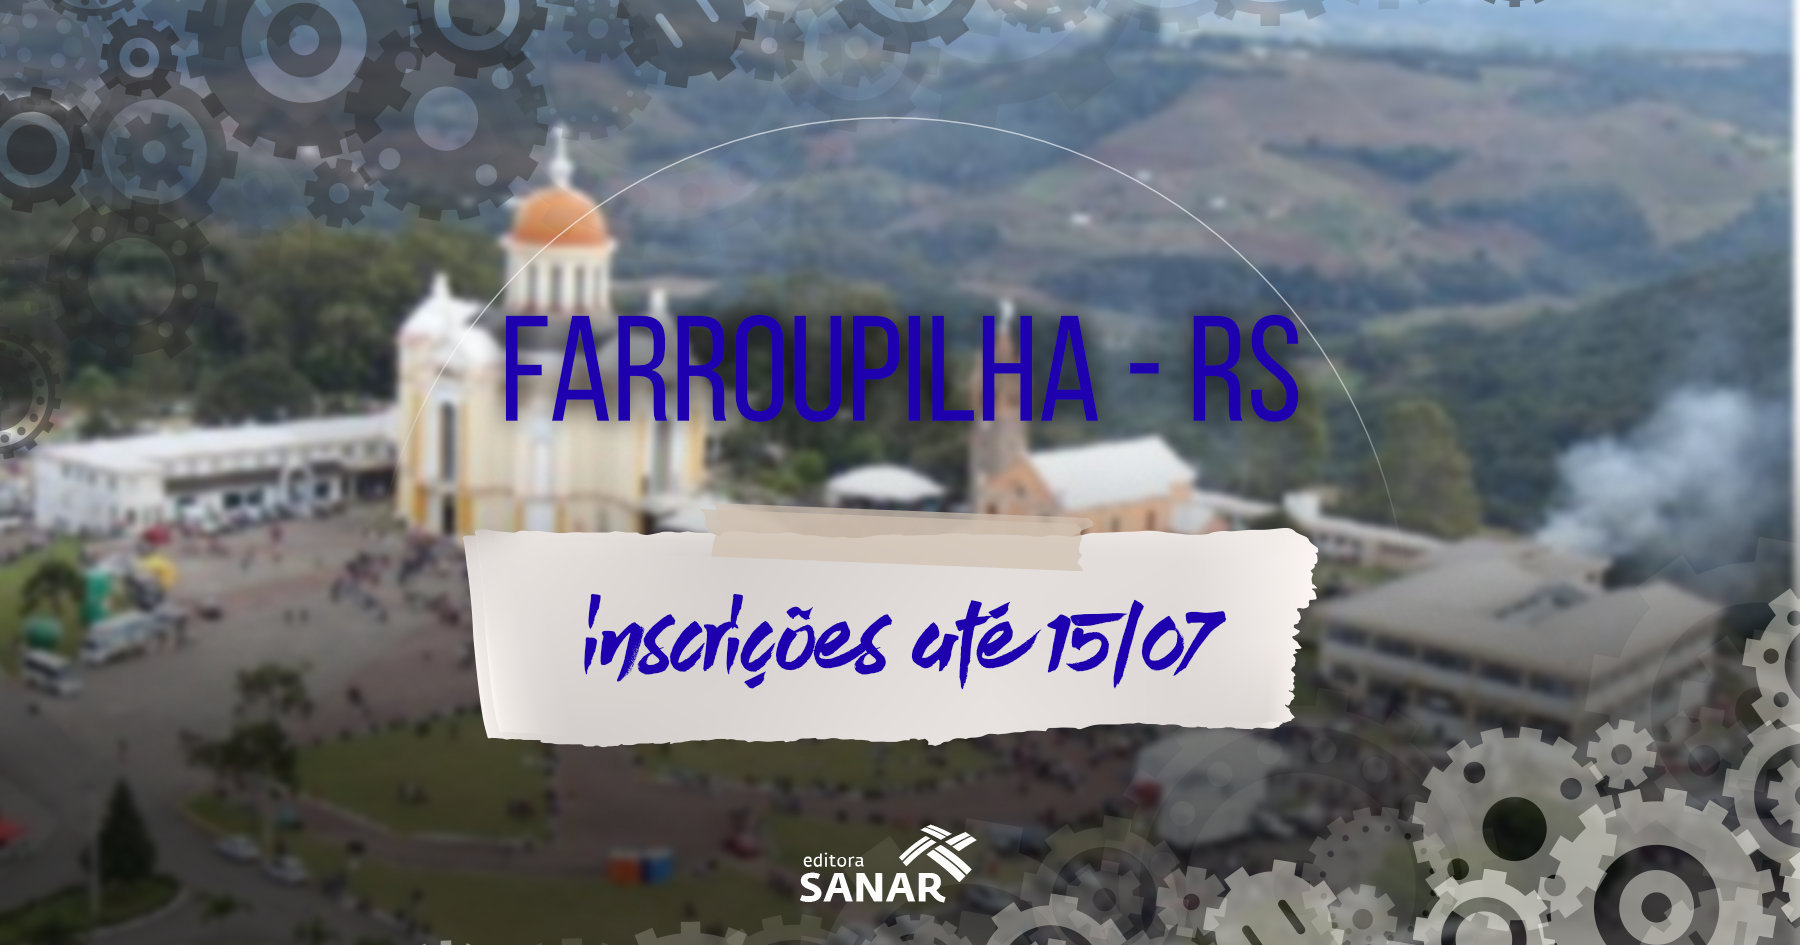 Concurso Público: Farroupilha (RS) divulga edital